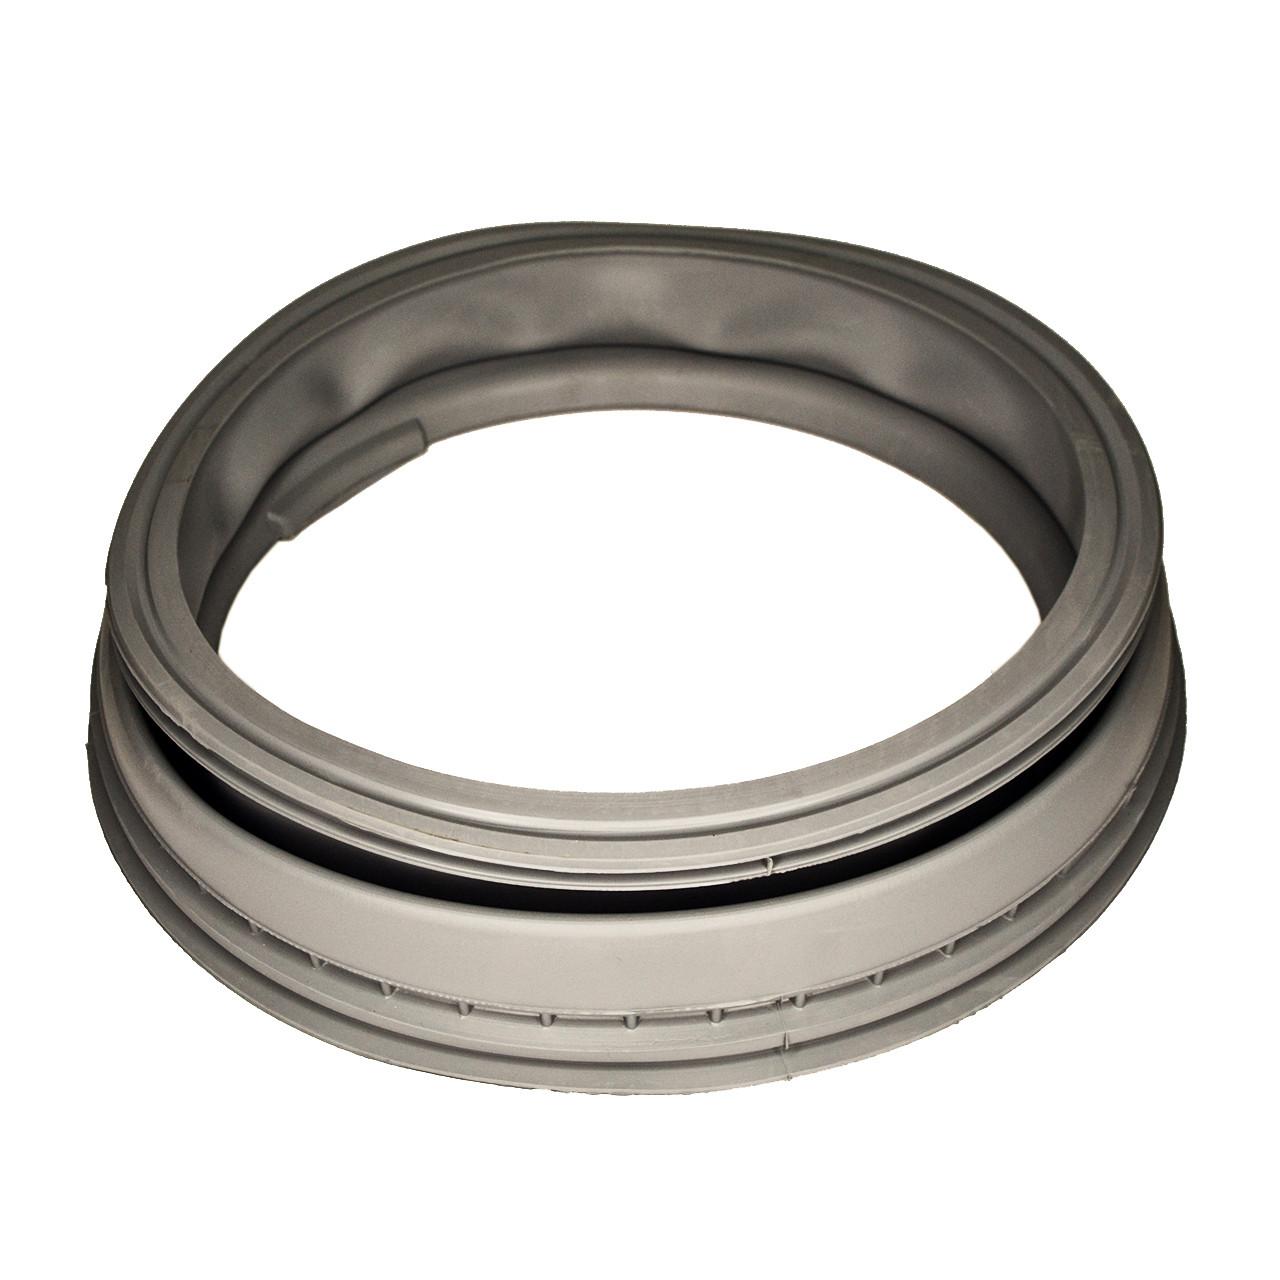 Резина (манжета) люка Bosch Simense 354135 не оригинал